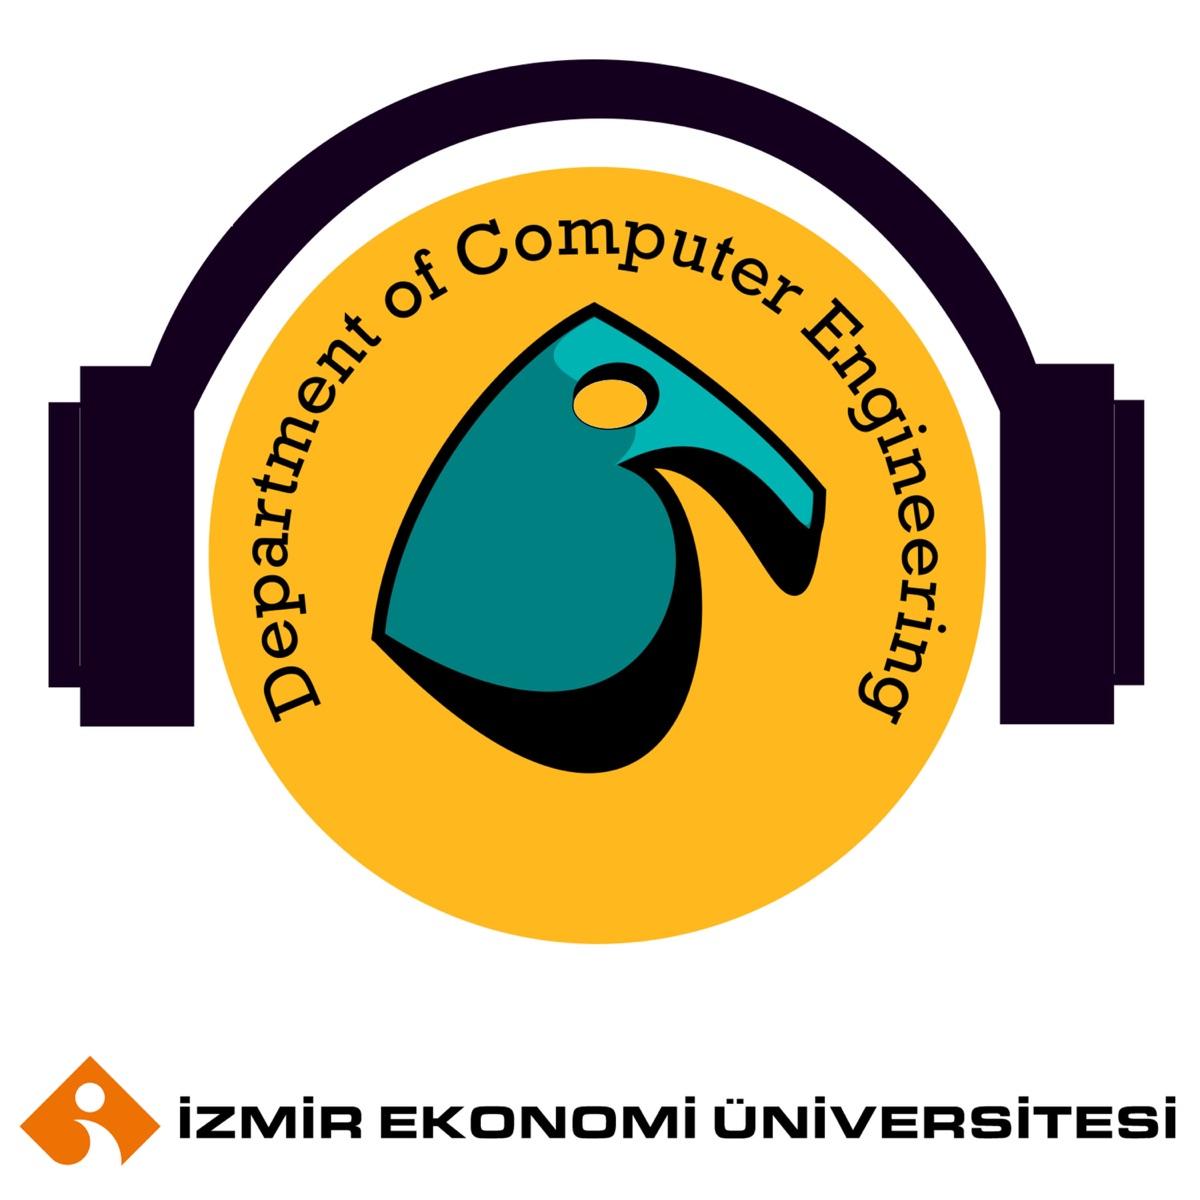 Izmir Ekonomi Universitesi Bilgisayar Muhendisligi Podcast Kanali Podcast Podtail